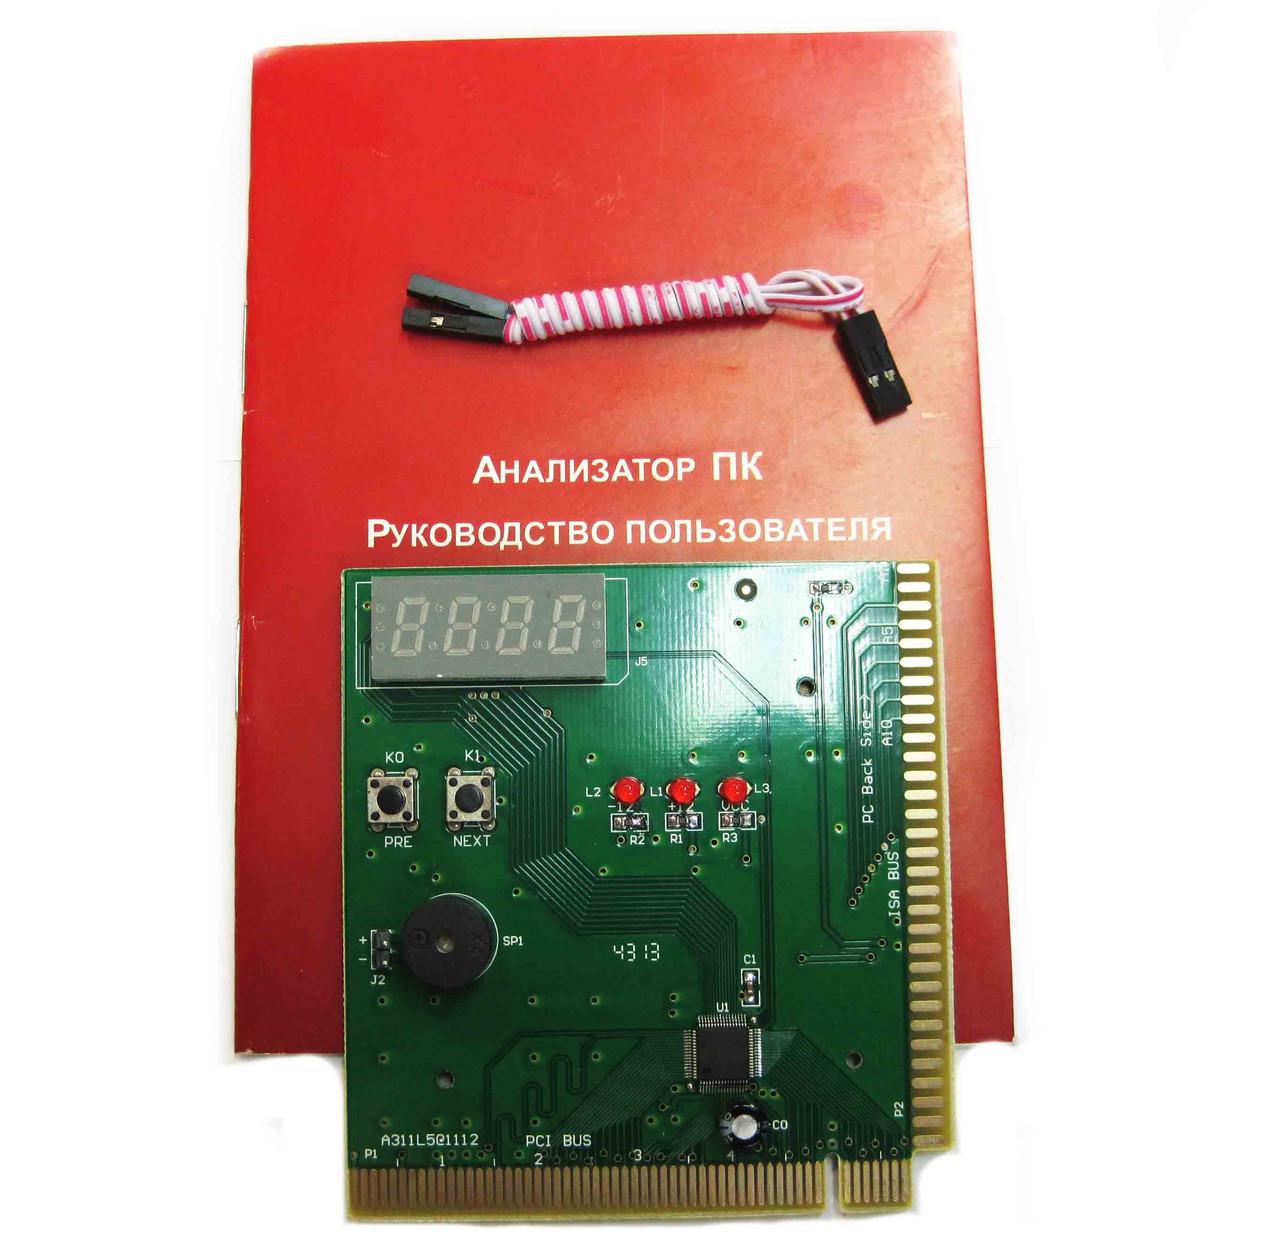 PCI ISA POST 4 карта, анализатор неисправности ПК